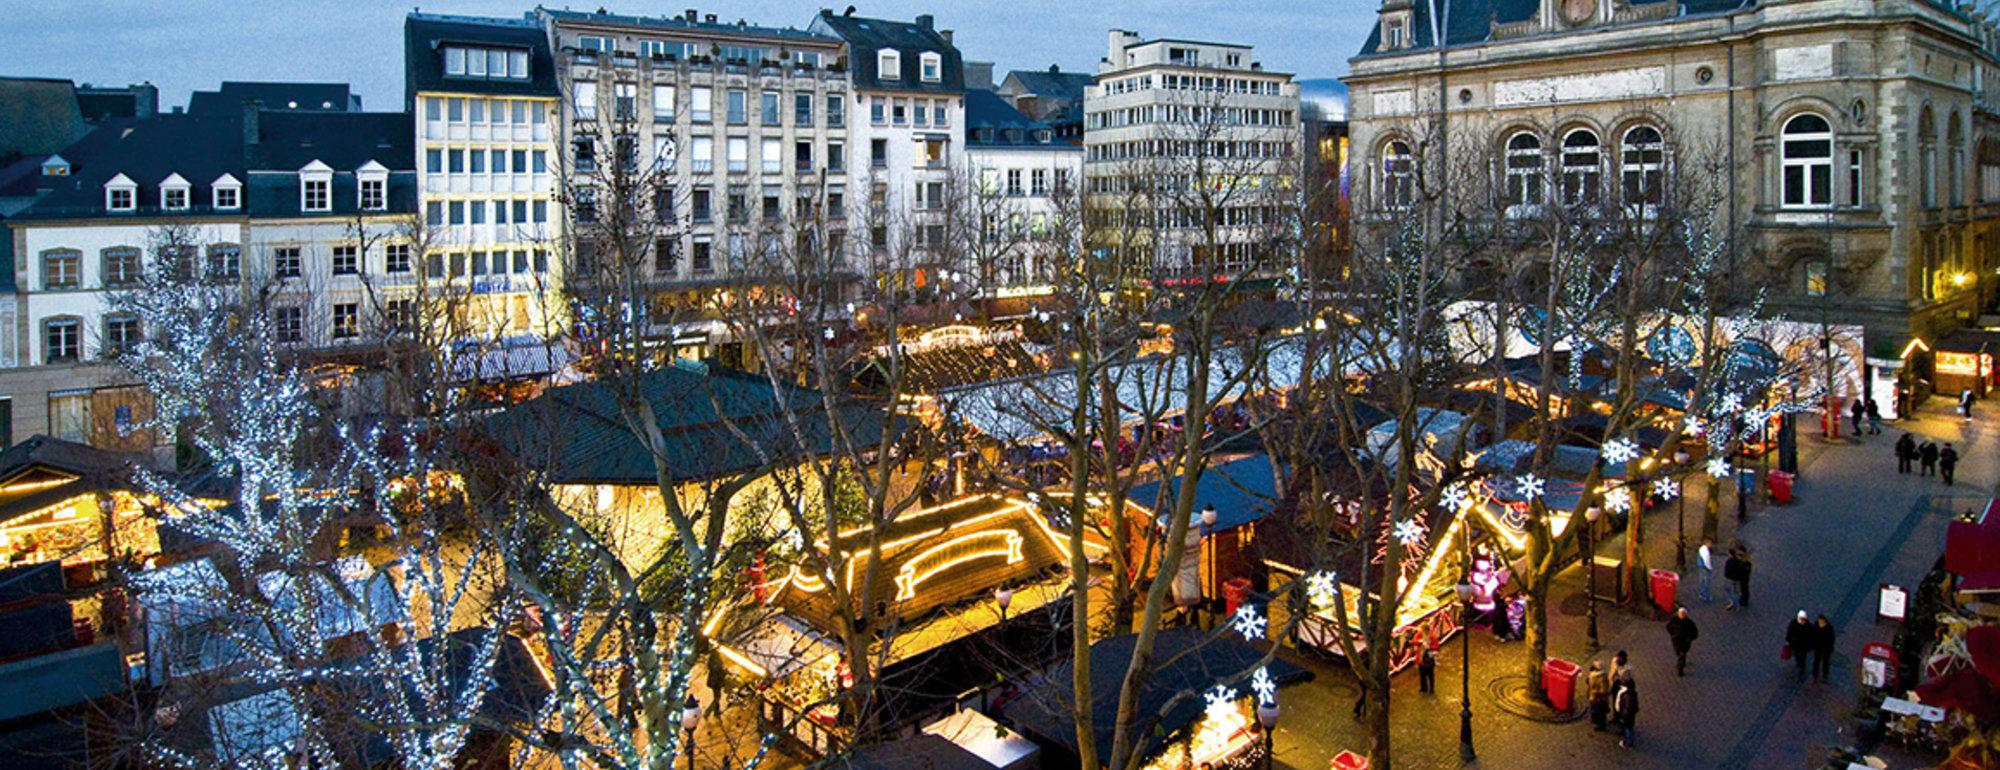 Luxemburg-Stad